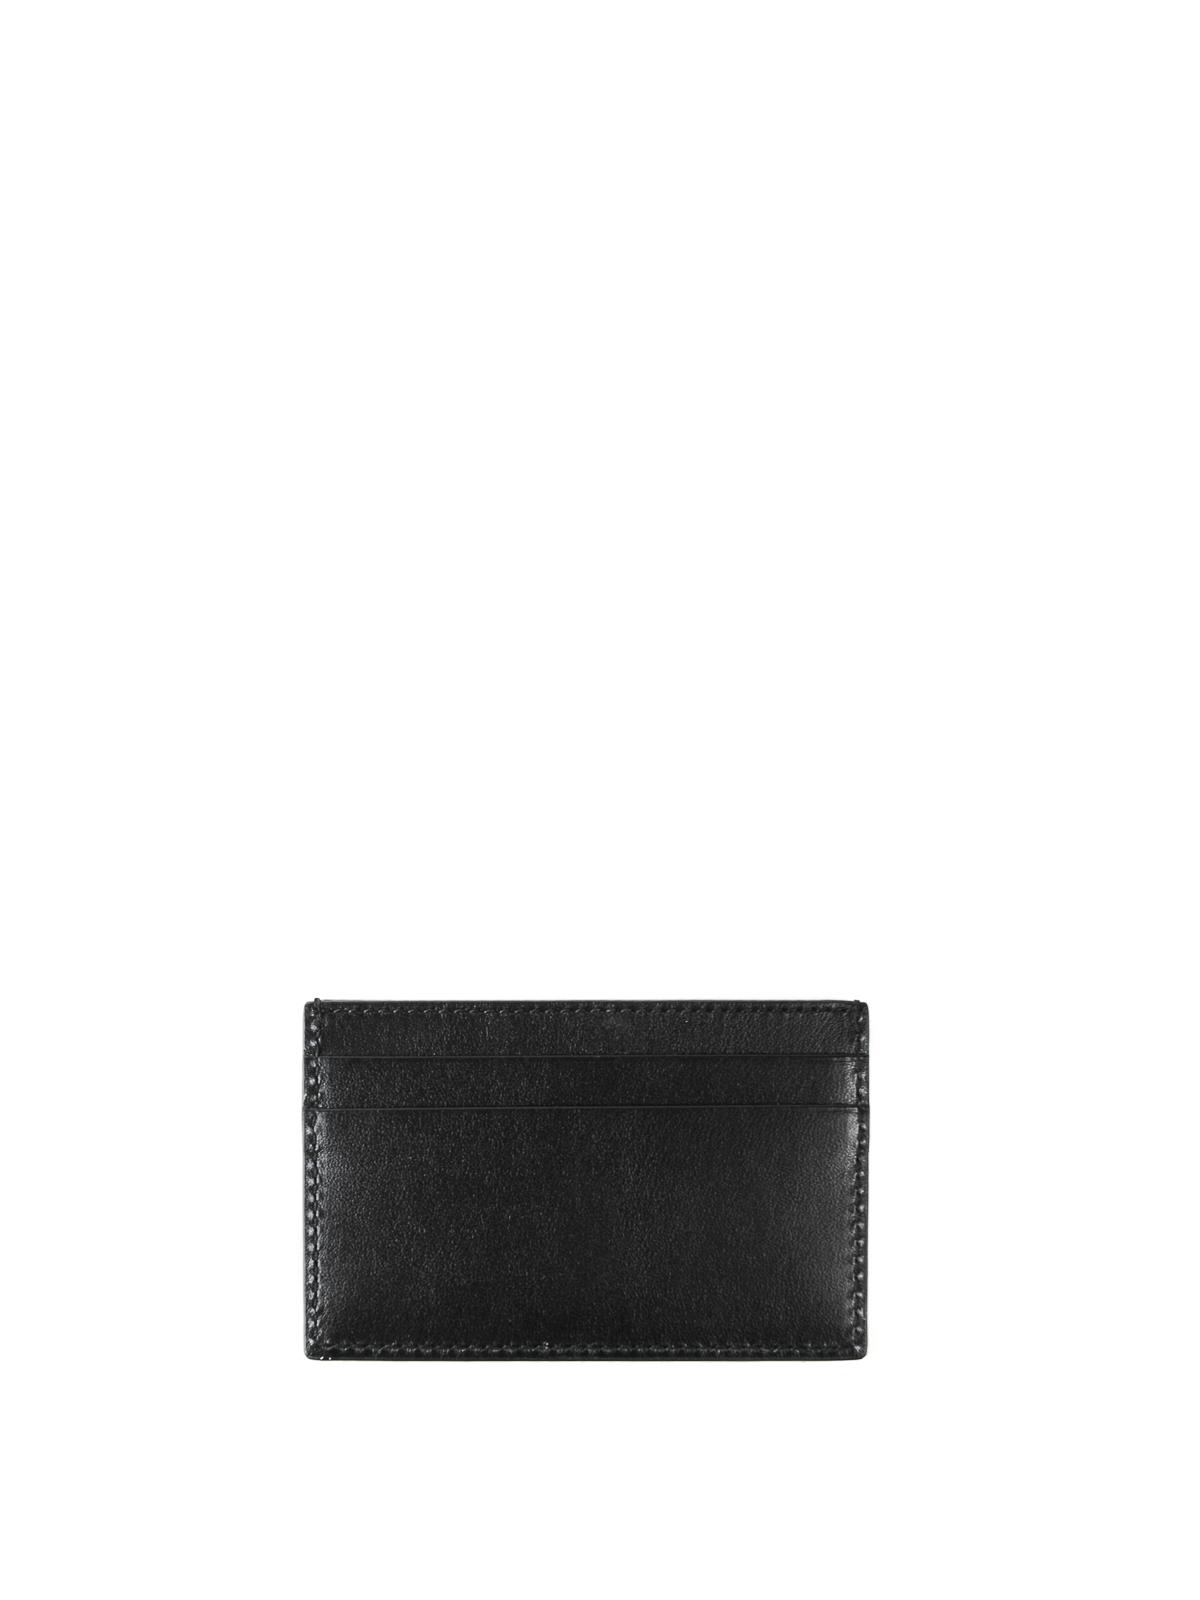 ae78a2d654b9 GUCCI: wallets & purses online - Gucci vintage logo print card case